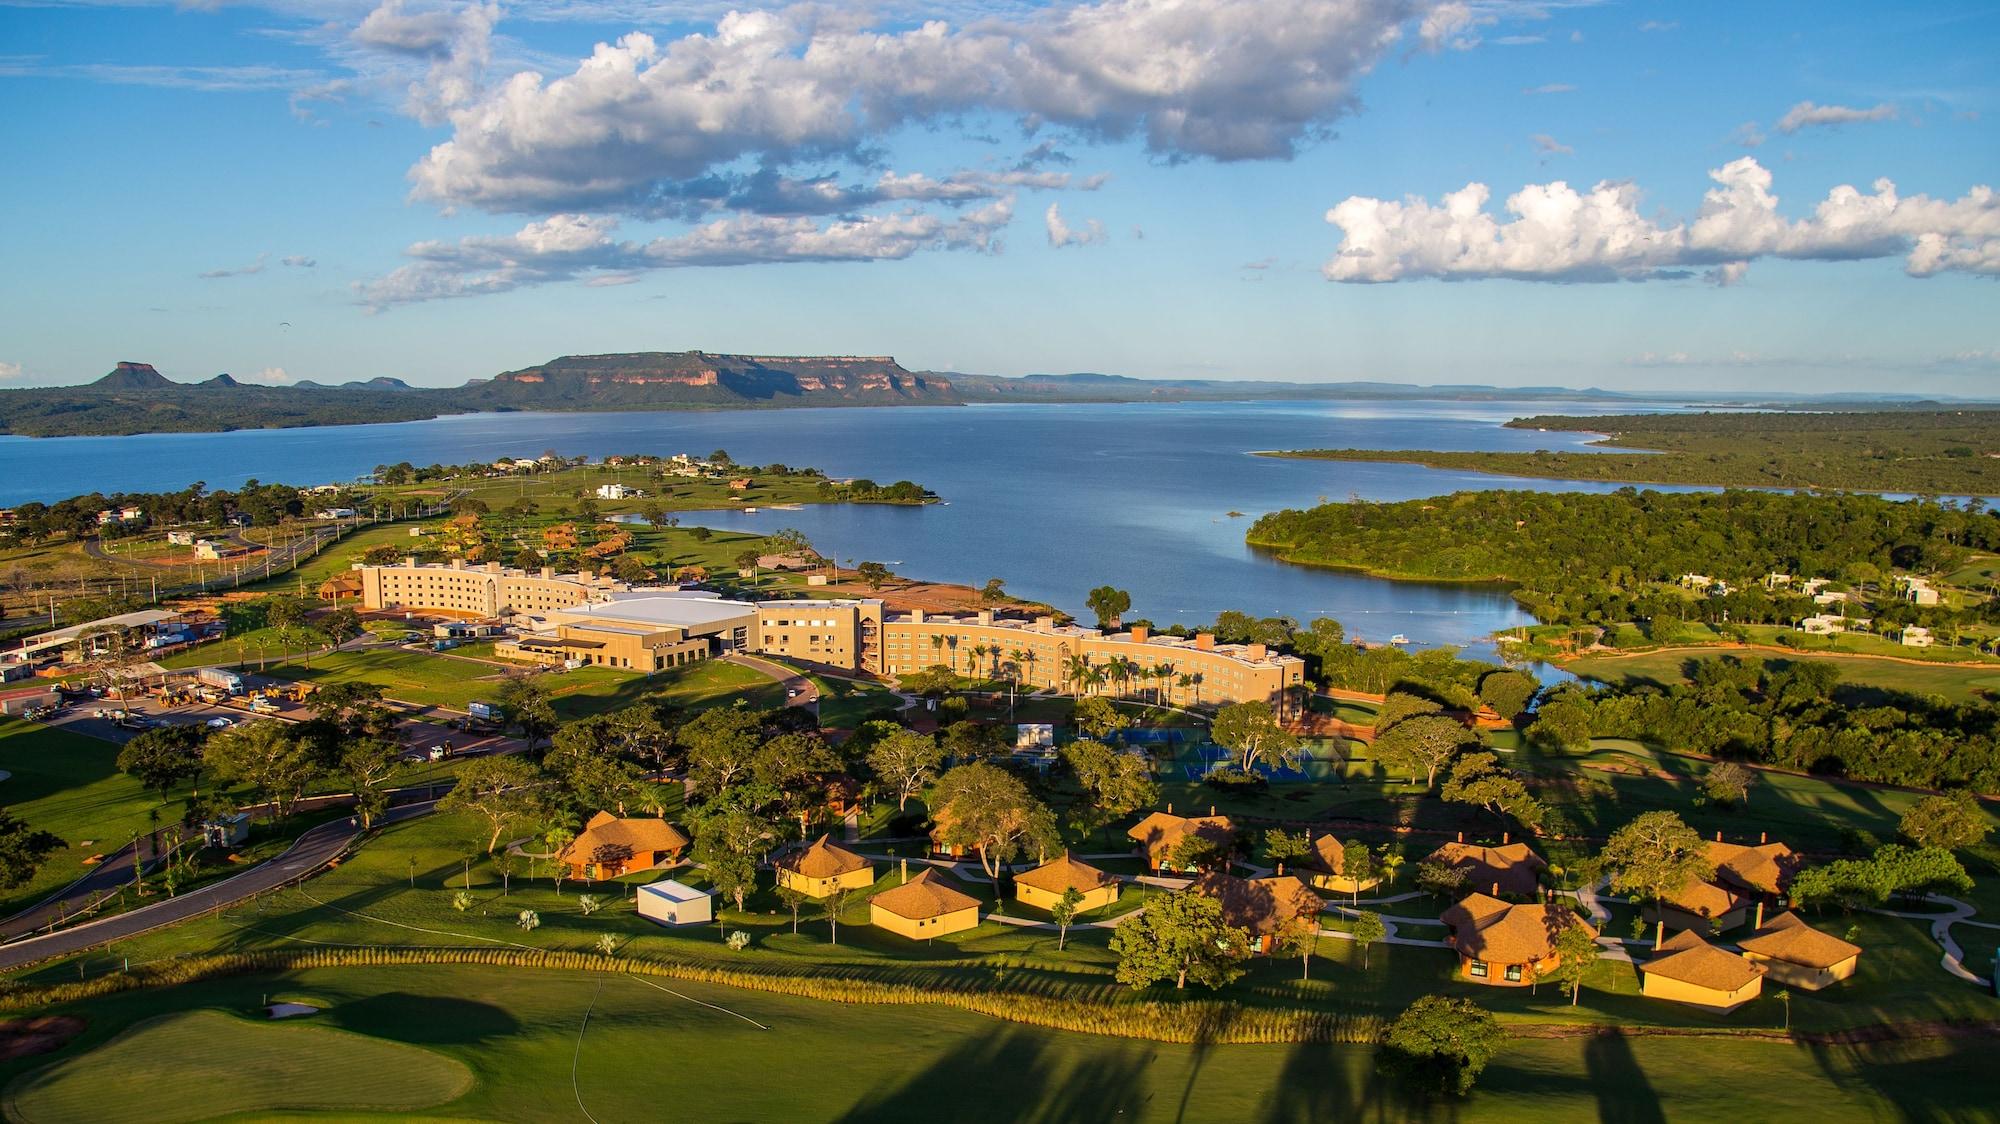 Malai Manso Resort Iate Convention & Spa, Chapada dos Guimarães